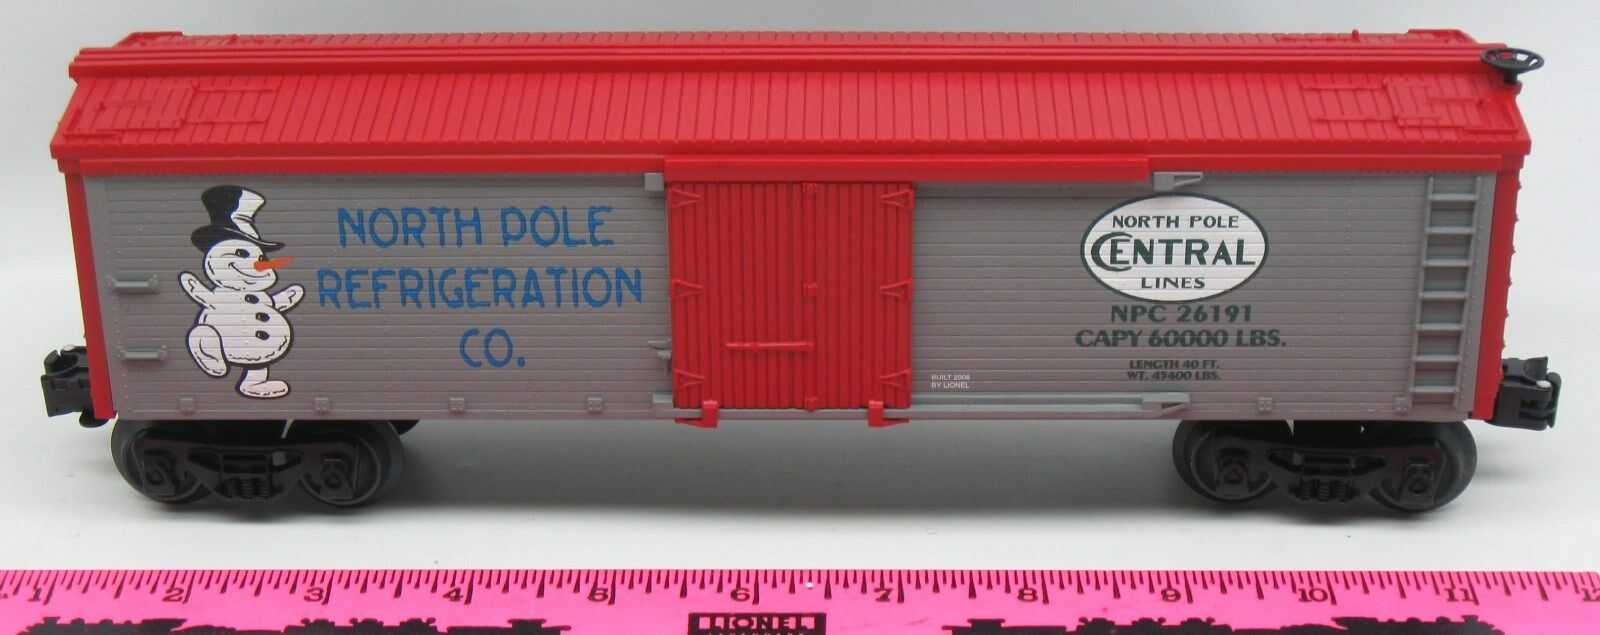 Lionel 26191 North Pole Refrigeration Co. Boxcar